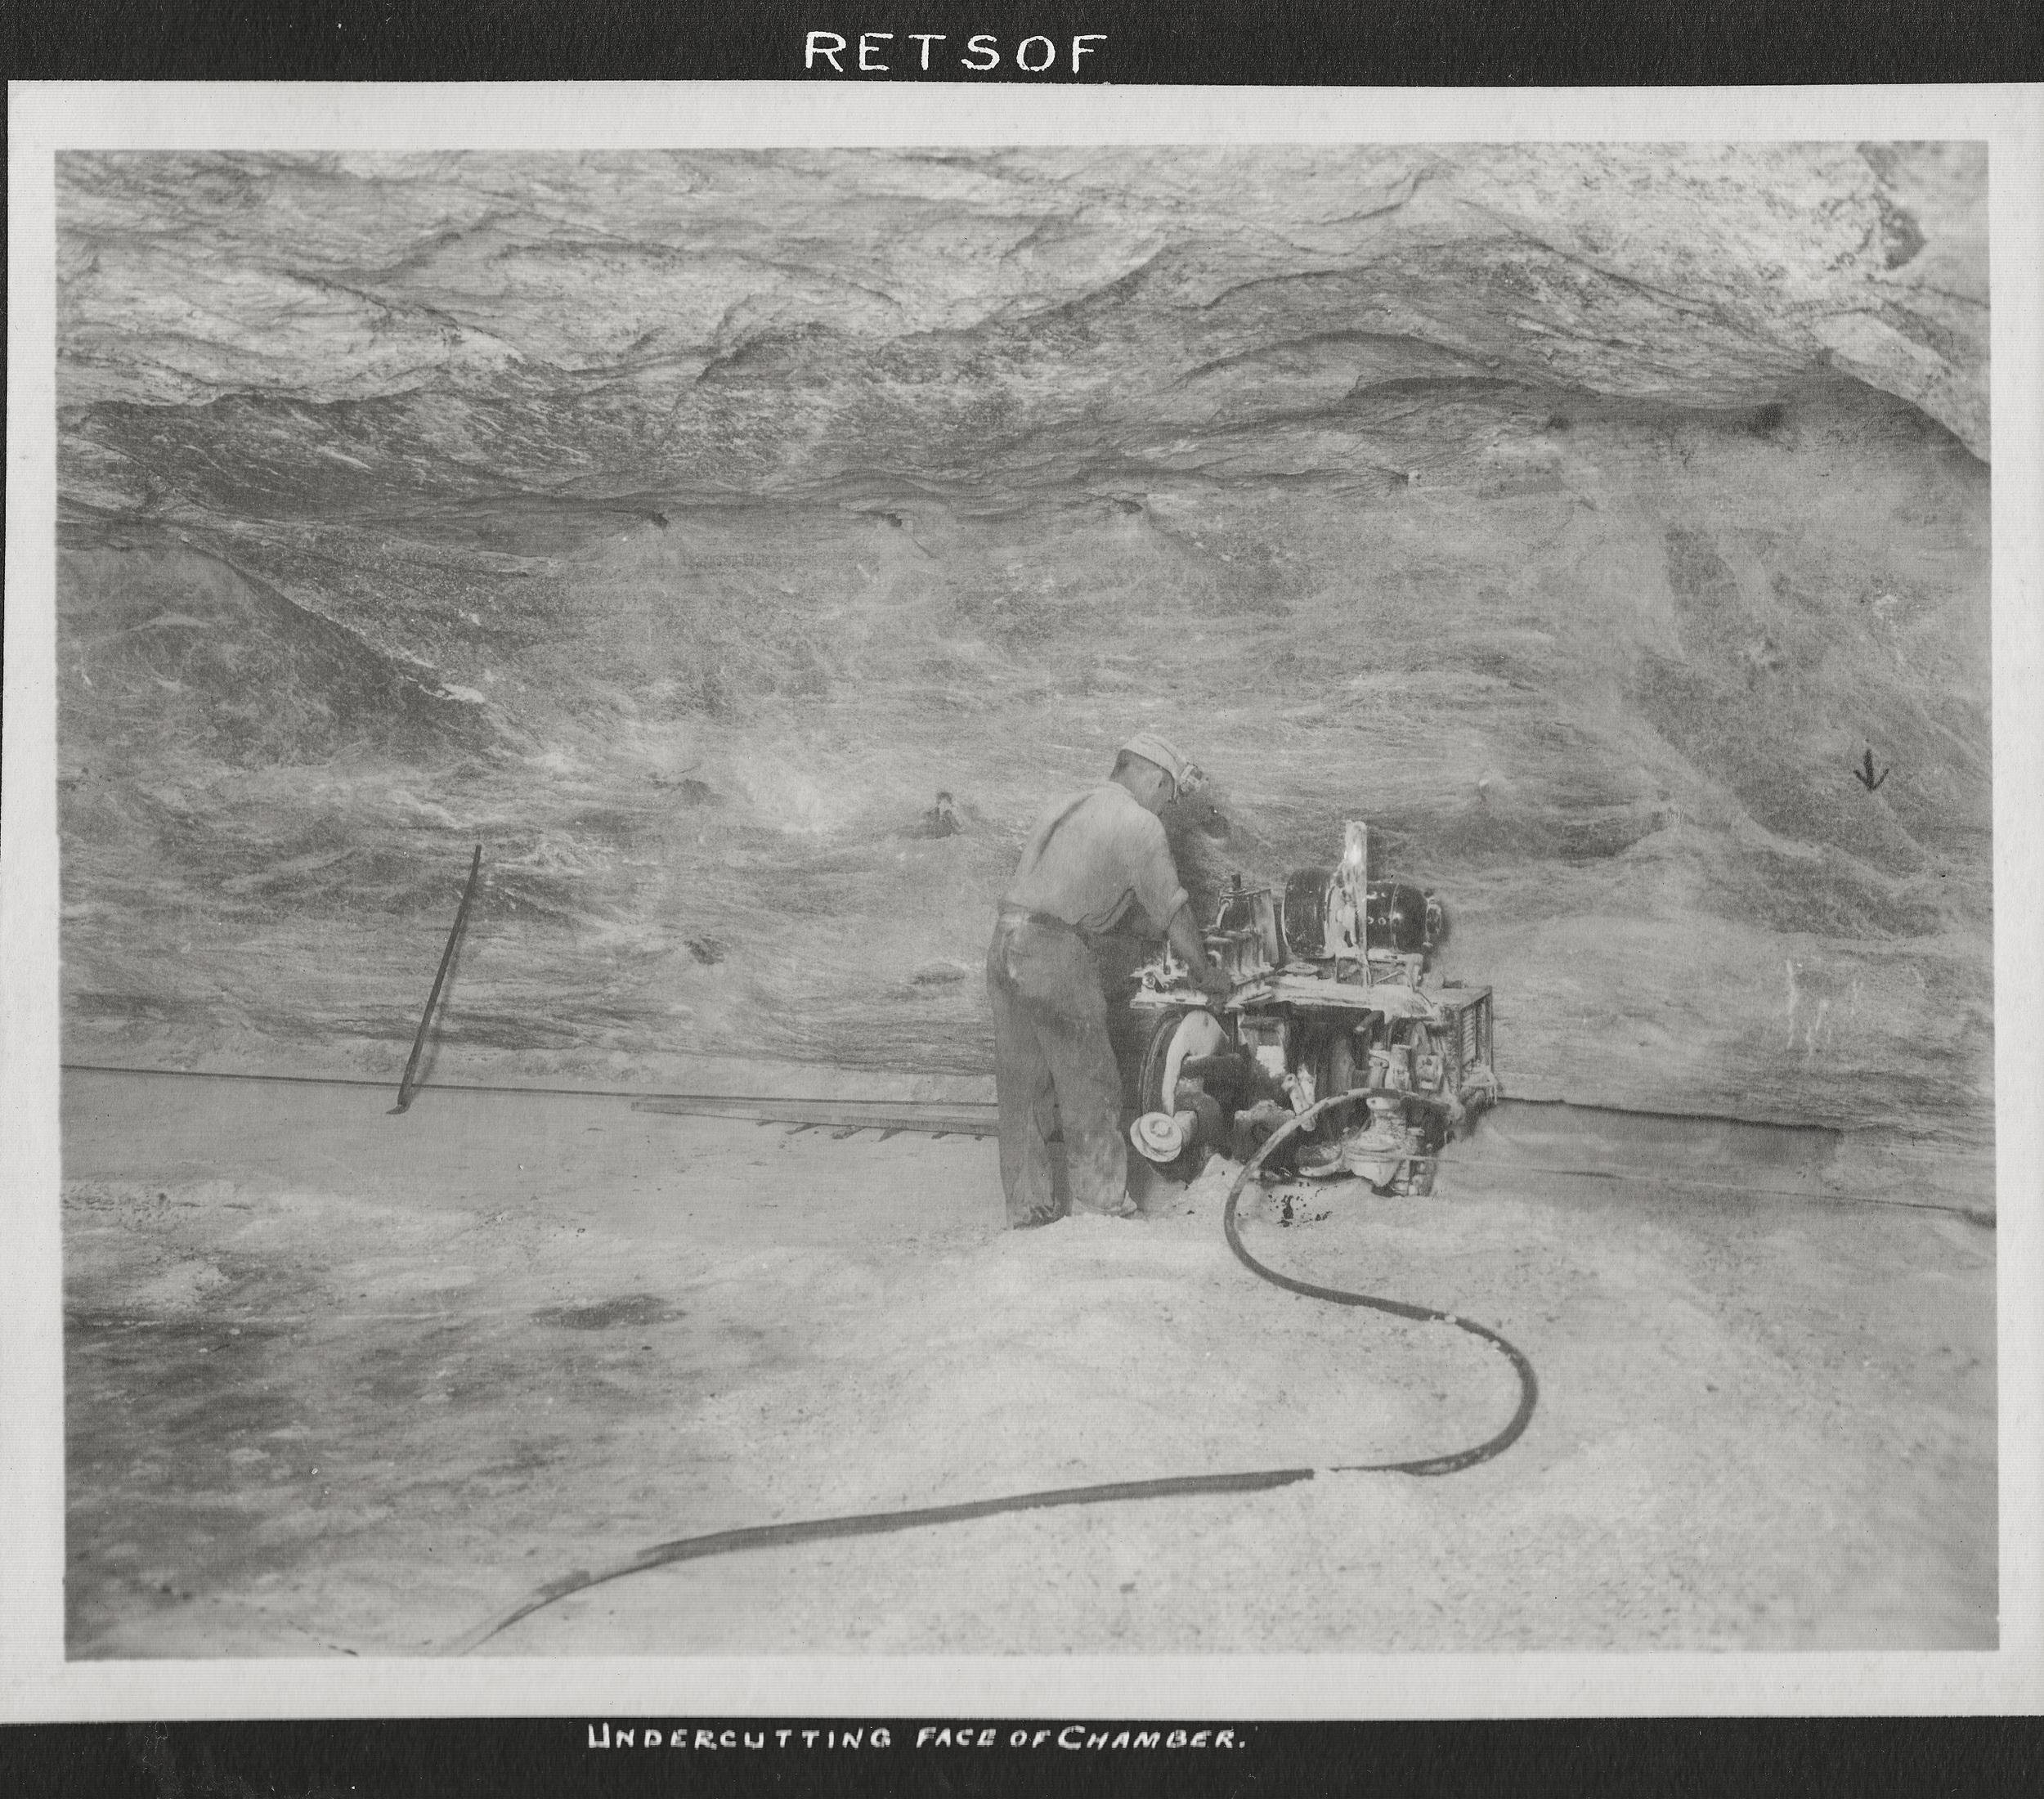 Undercutting face of chamber in the Retsof Salt Mine.